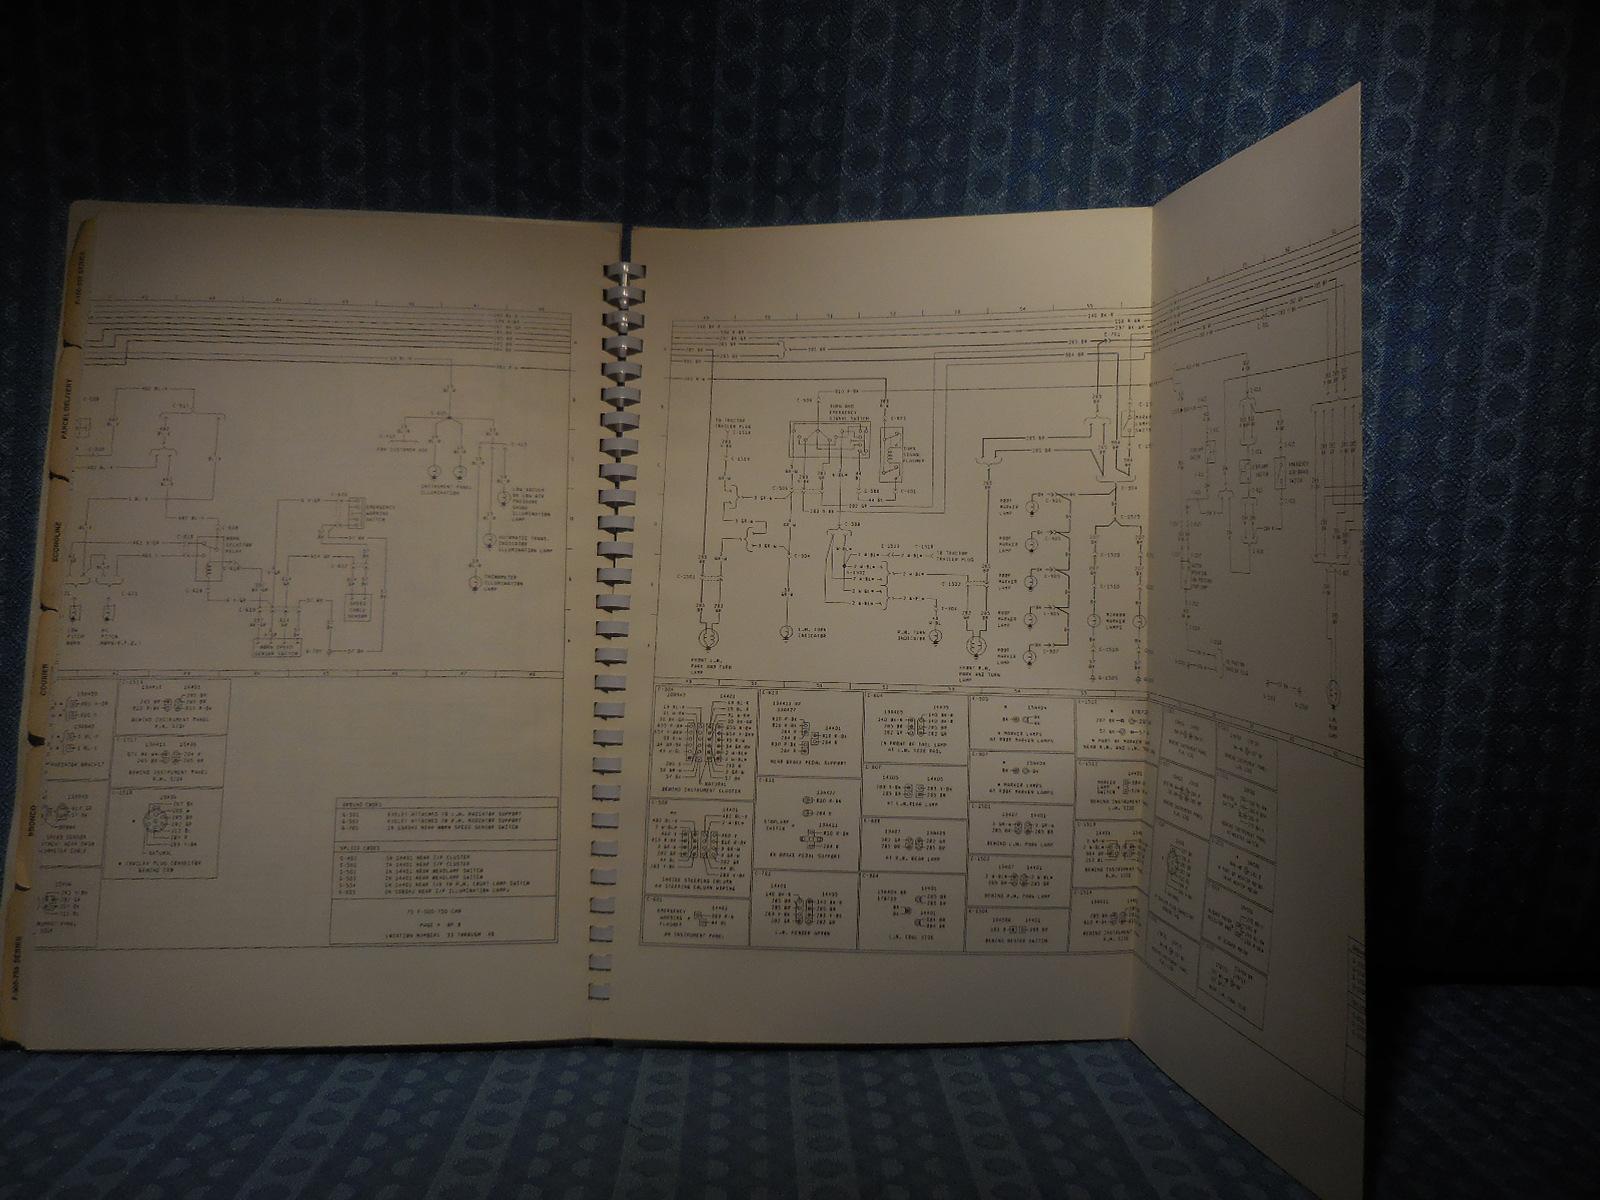 1975 f250 wiring diagram 1975 ford truck oem wiring diagrams bronco  pickup  courier  1975 ford truck oem wiring diagrams